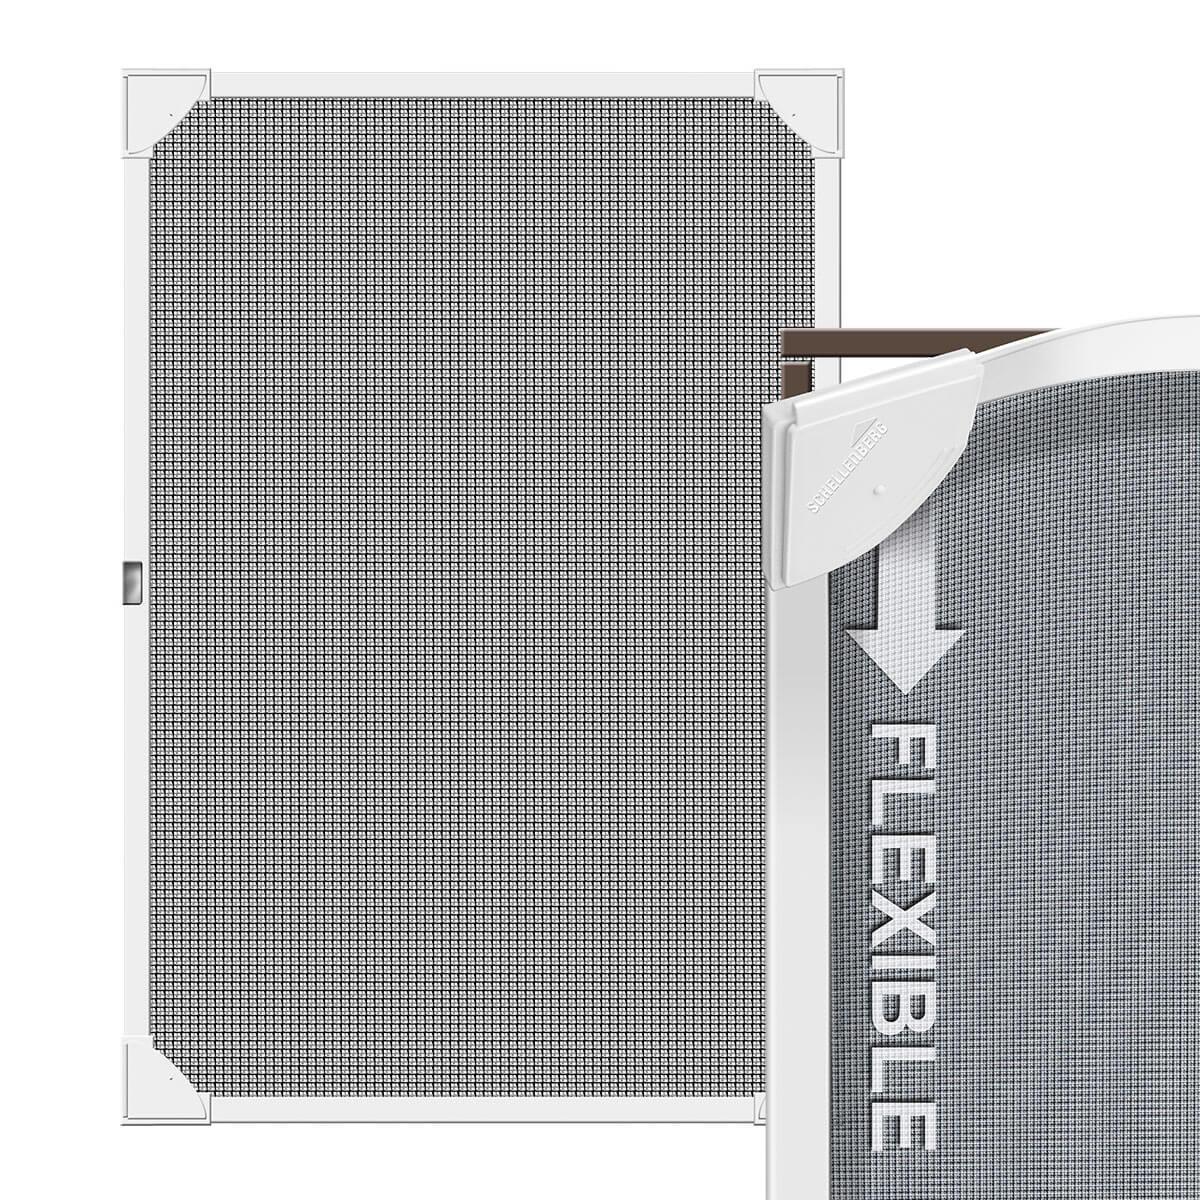 Häufig Insektenschutz Magnetrahmen Dachfenster | Schellenberg-Shop YI71